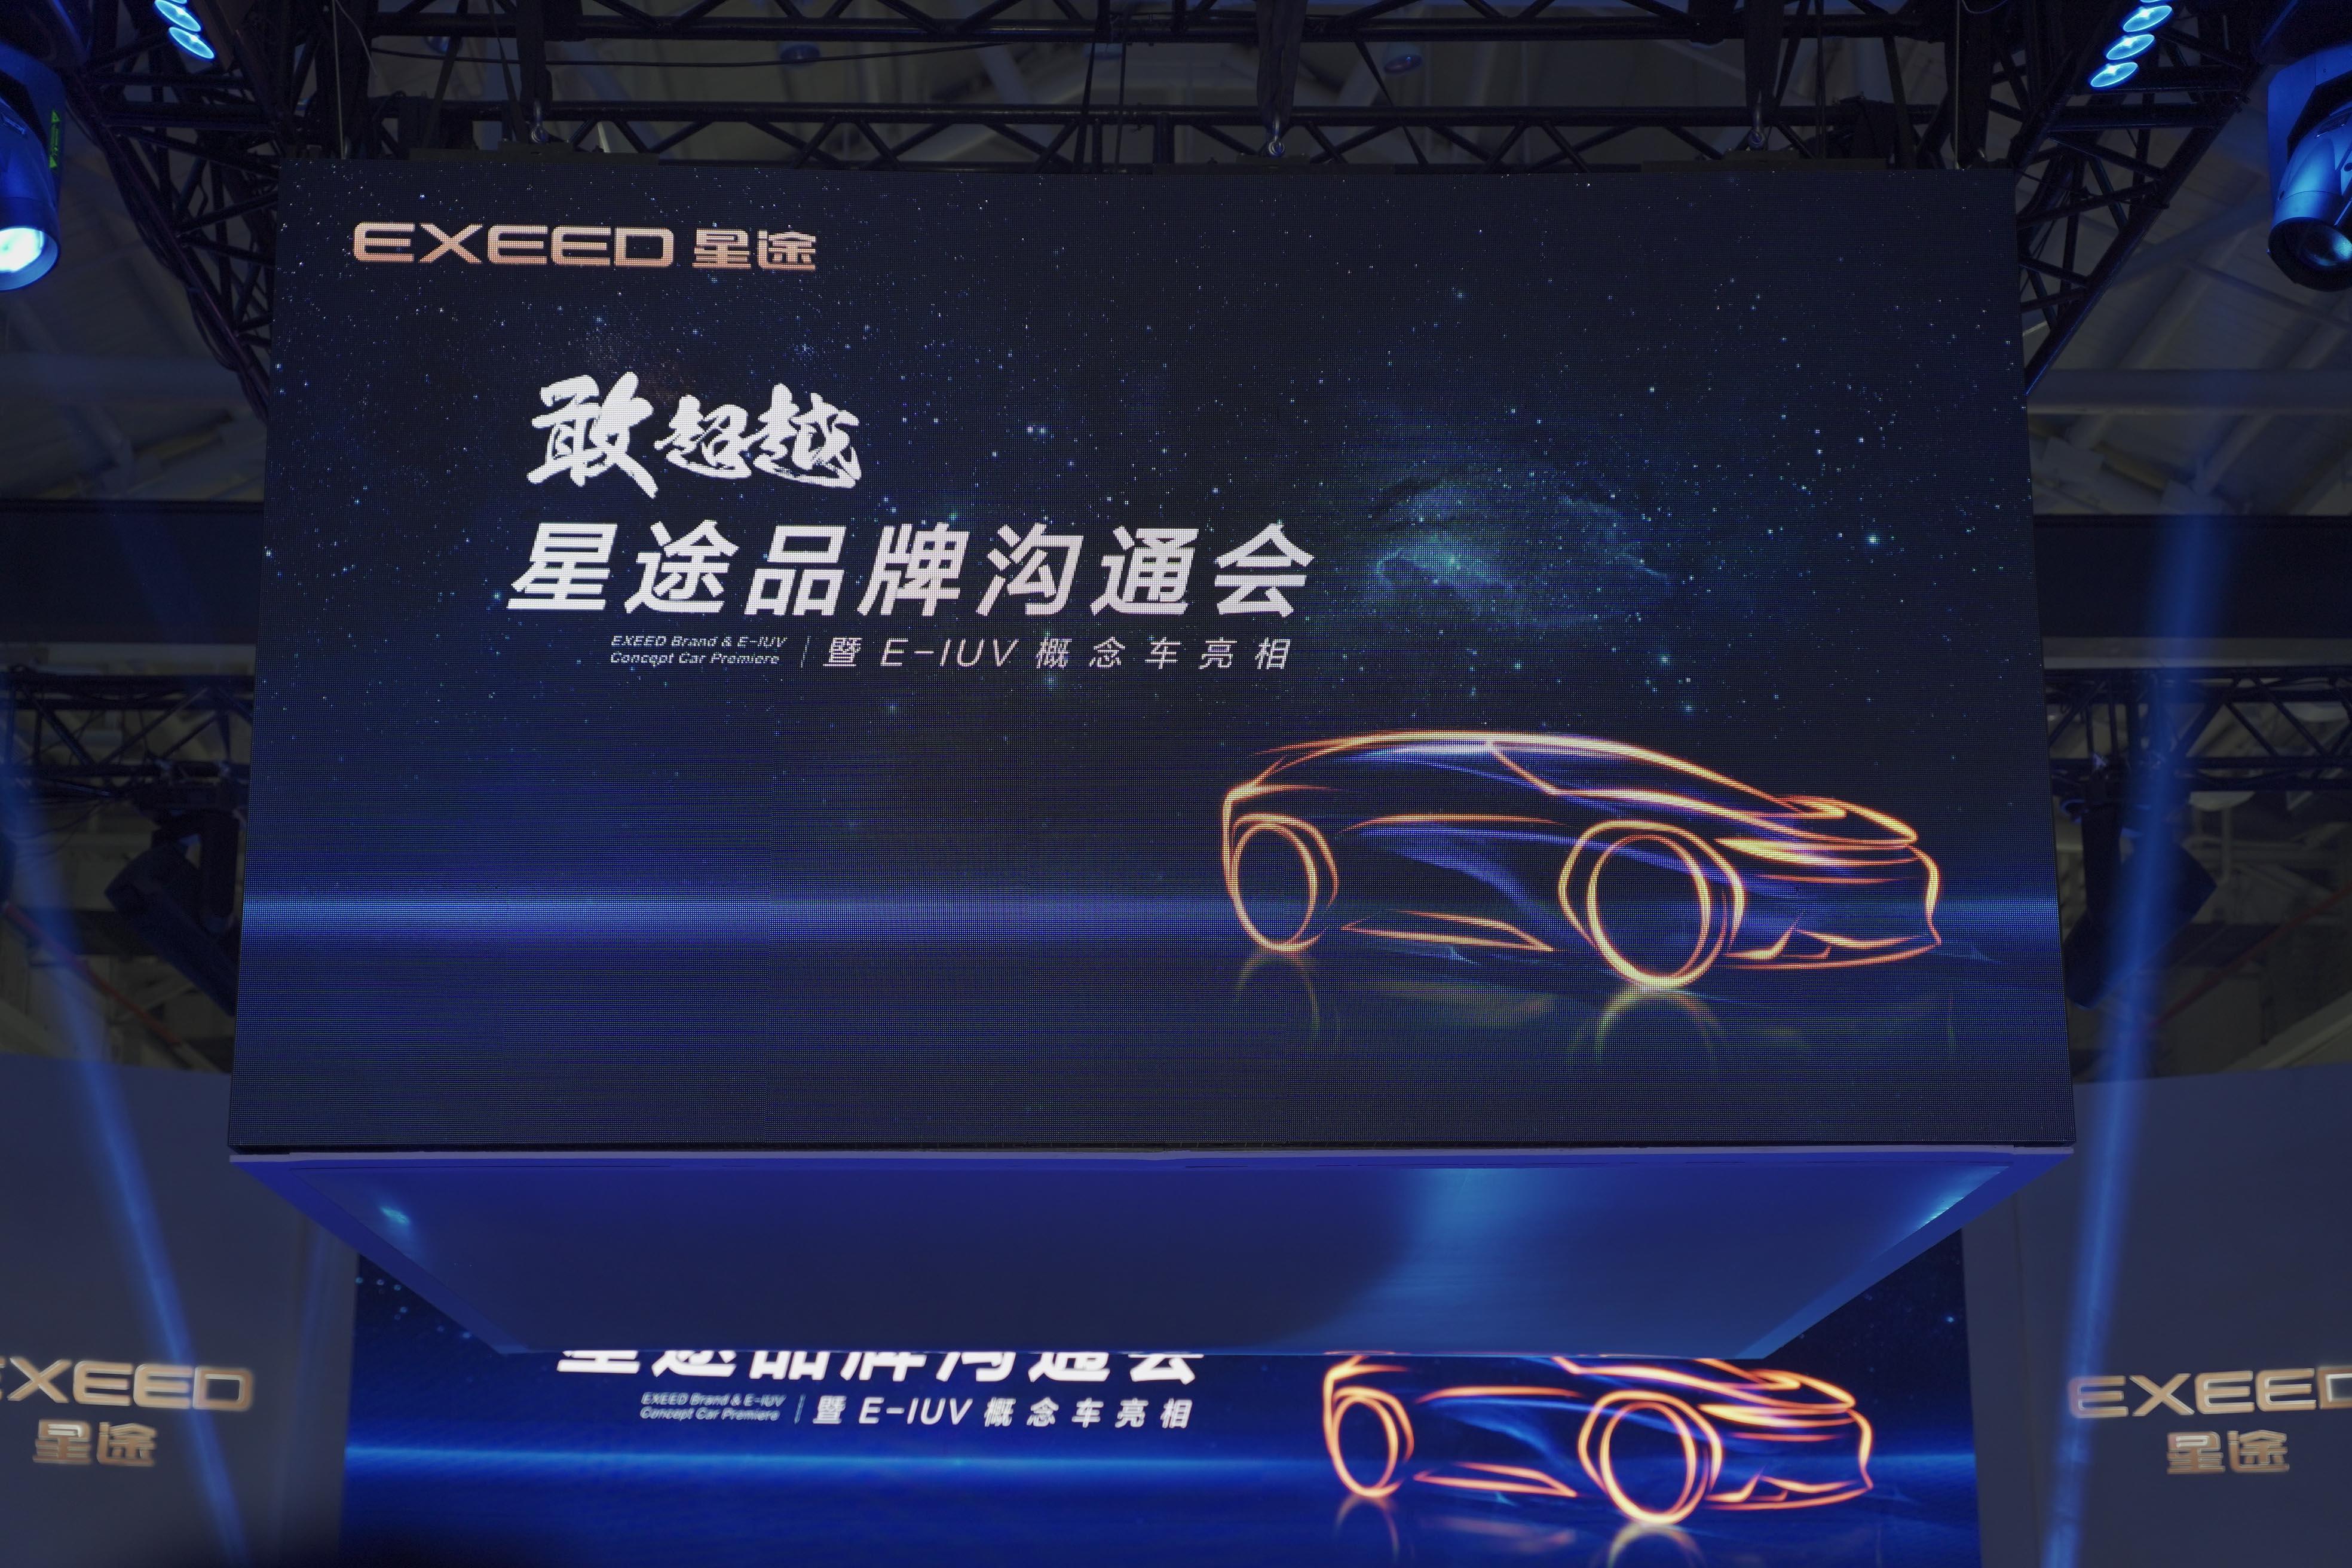 EXEED星途品牌概念车 E-IUV亮相